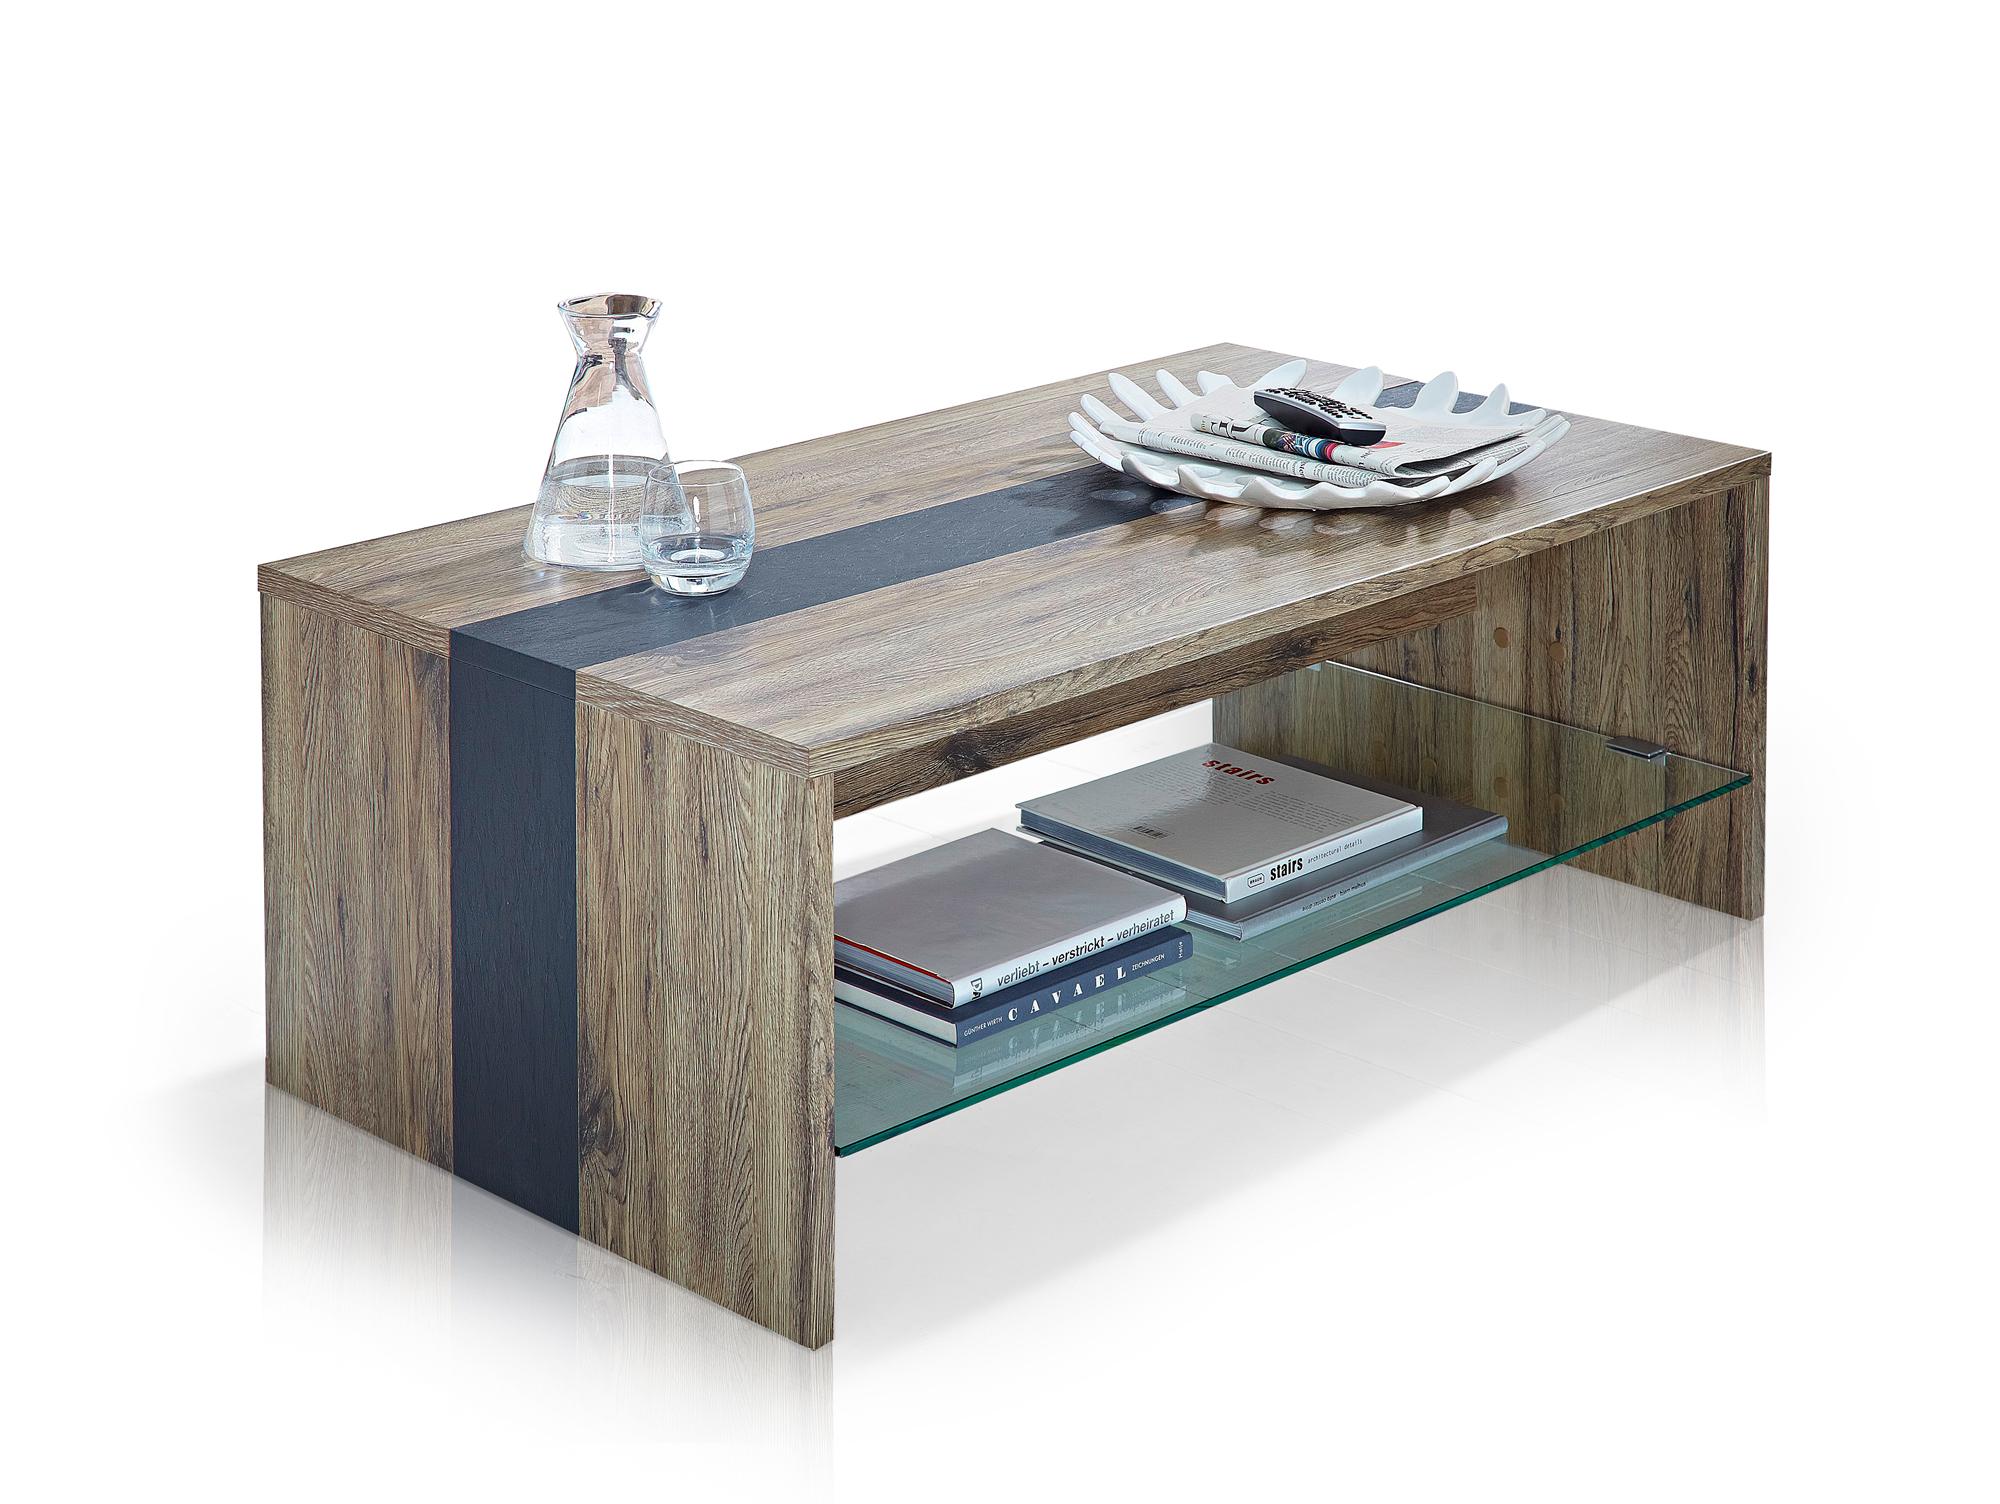 diego couchtisch san remo schiefer. Black Bedroom Furniture Sets. Home Design Ideas